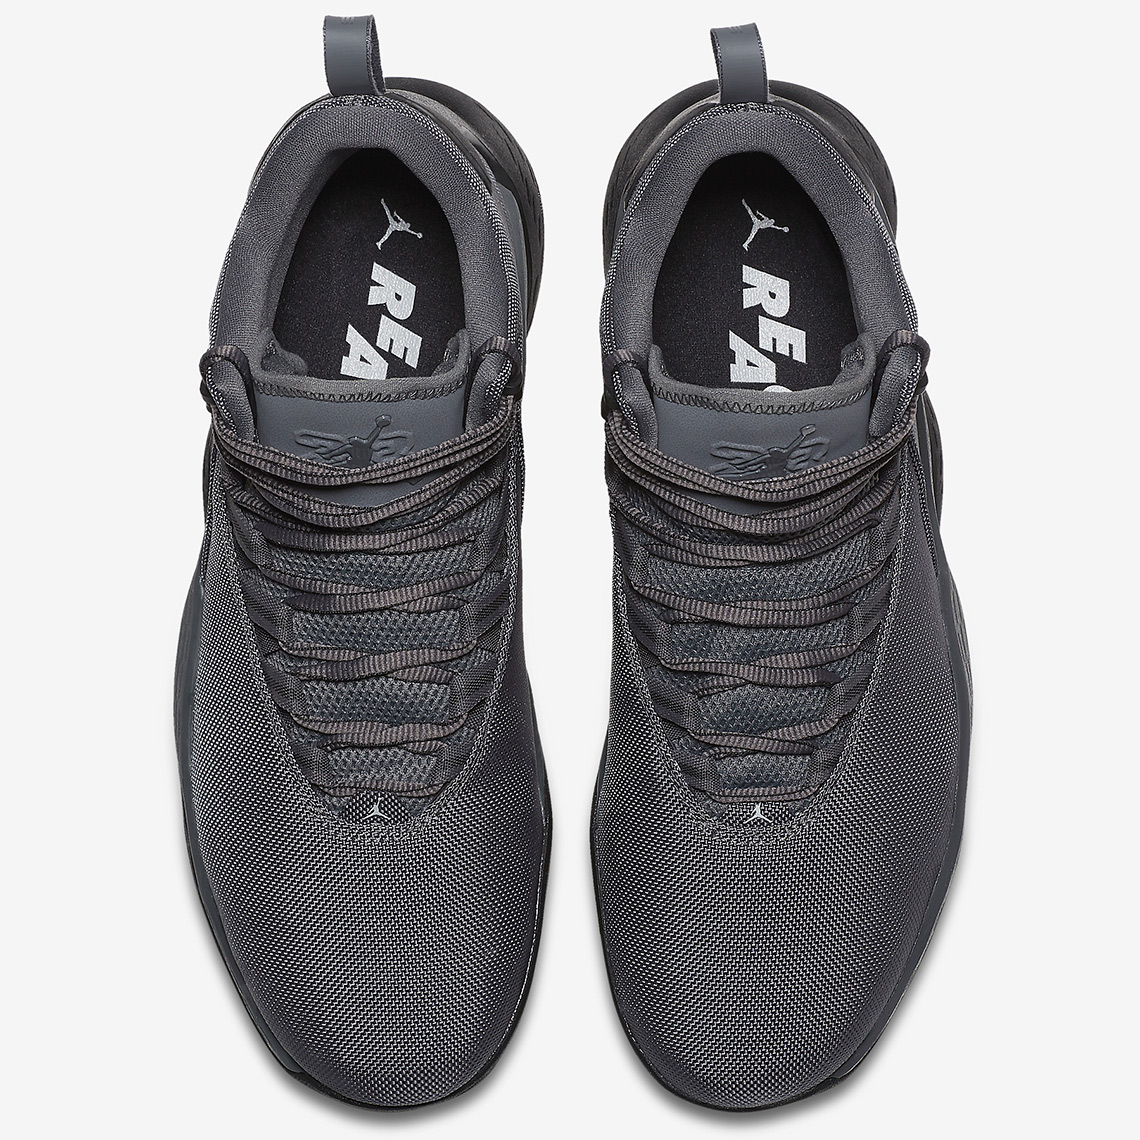 Padre Fage Salvataggio virtù  Jordan Super.Fly MVP Photos + Release Info | SneakerNews.com